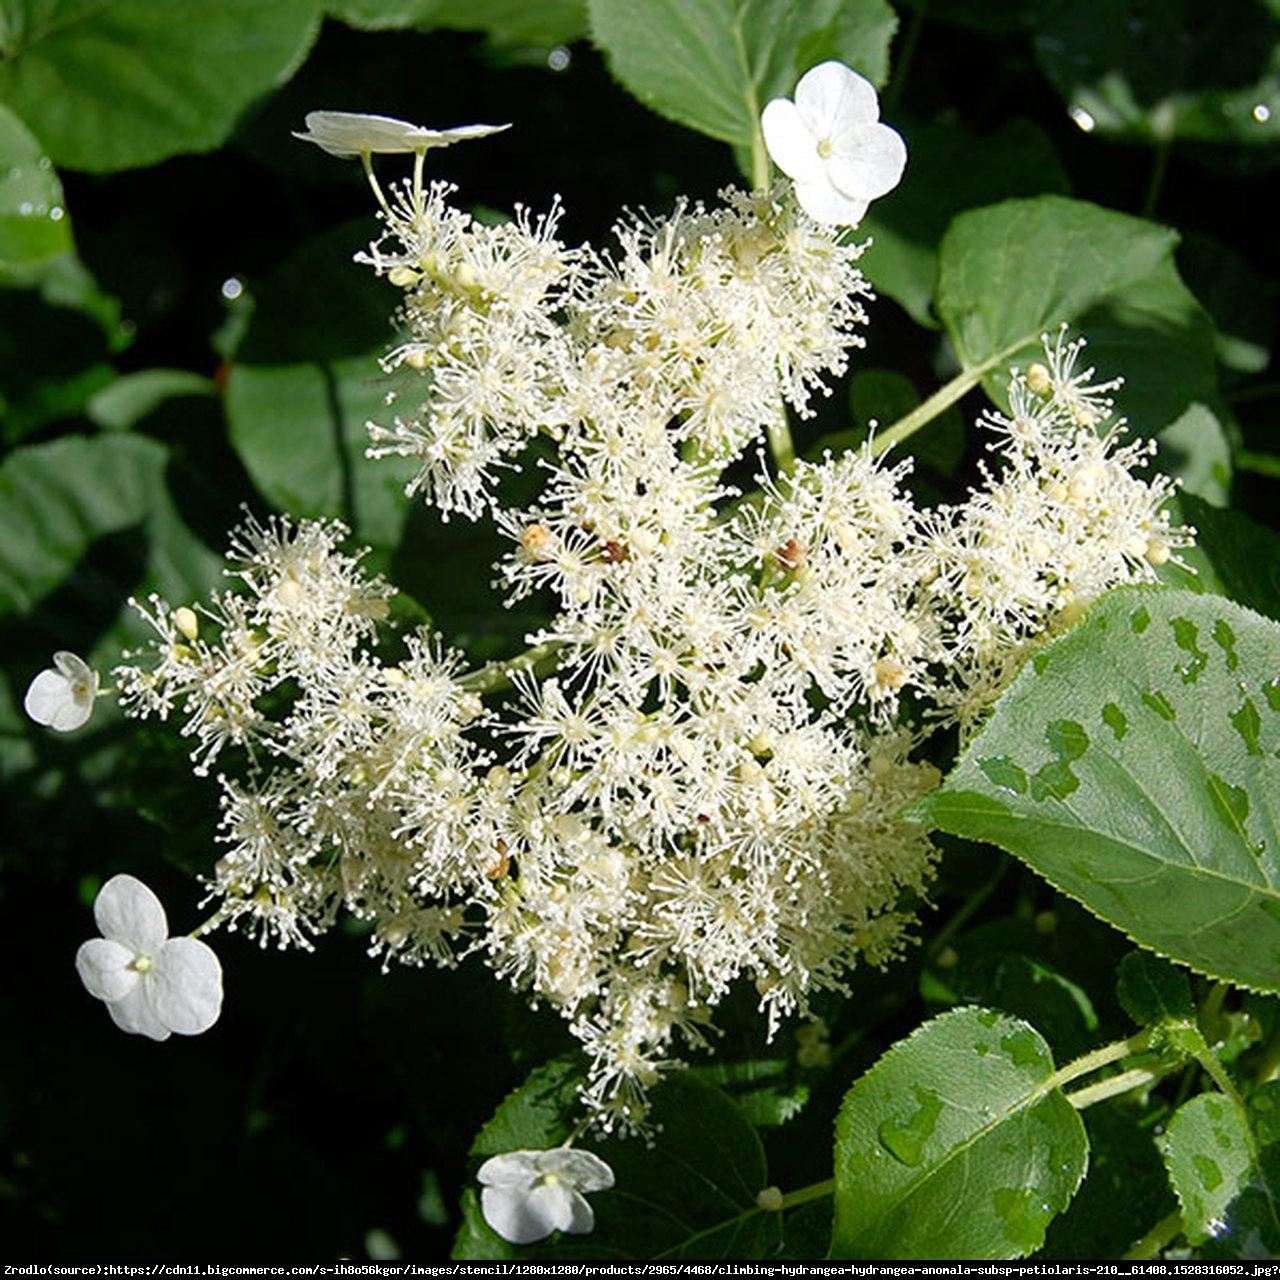 Hortensja pnąca - Hydrangea anomala subsp. petiolaris